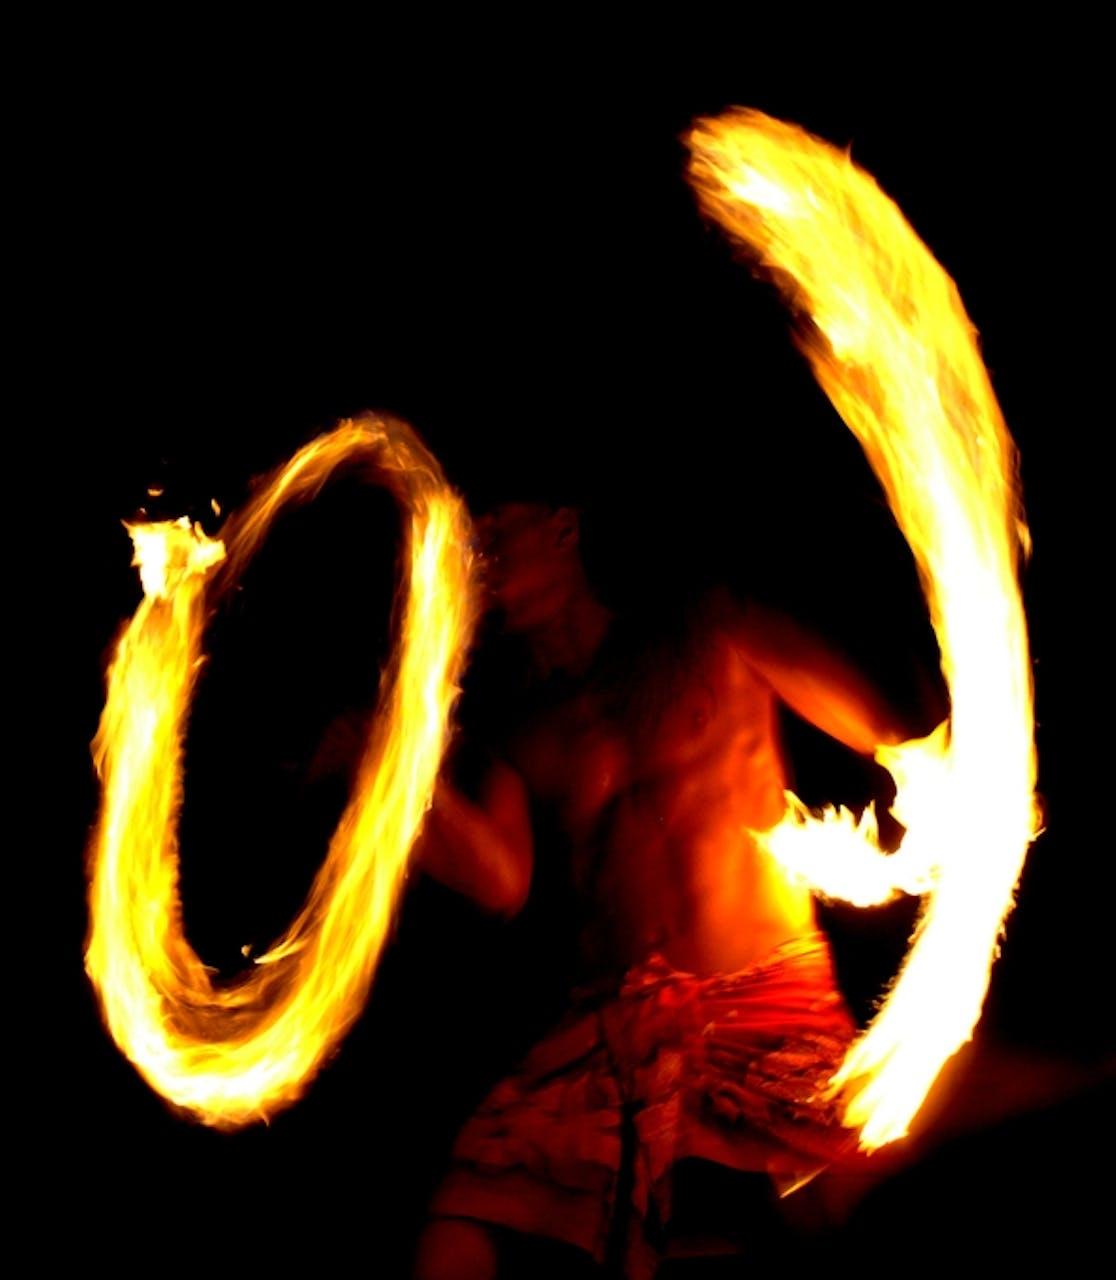 Big Island Luau Fire dancer. image courtesy of Joel Telling